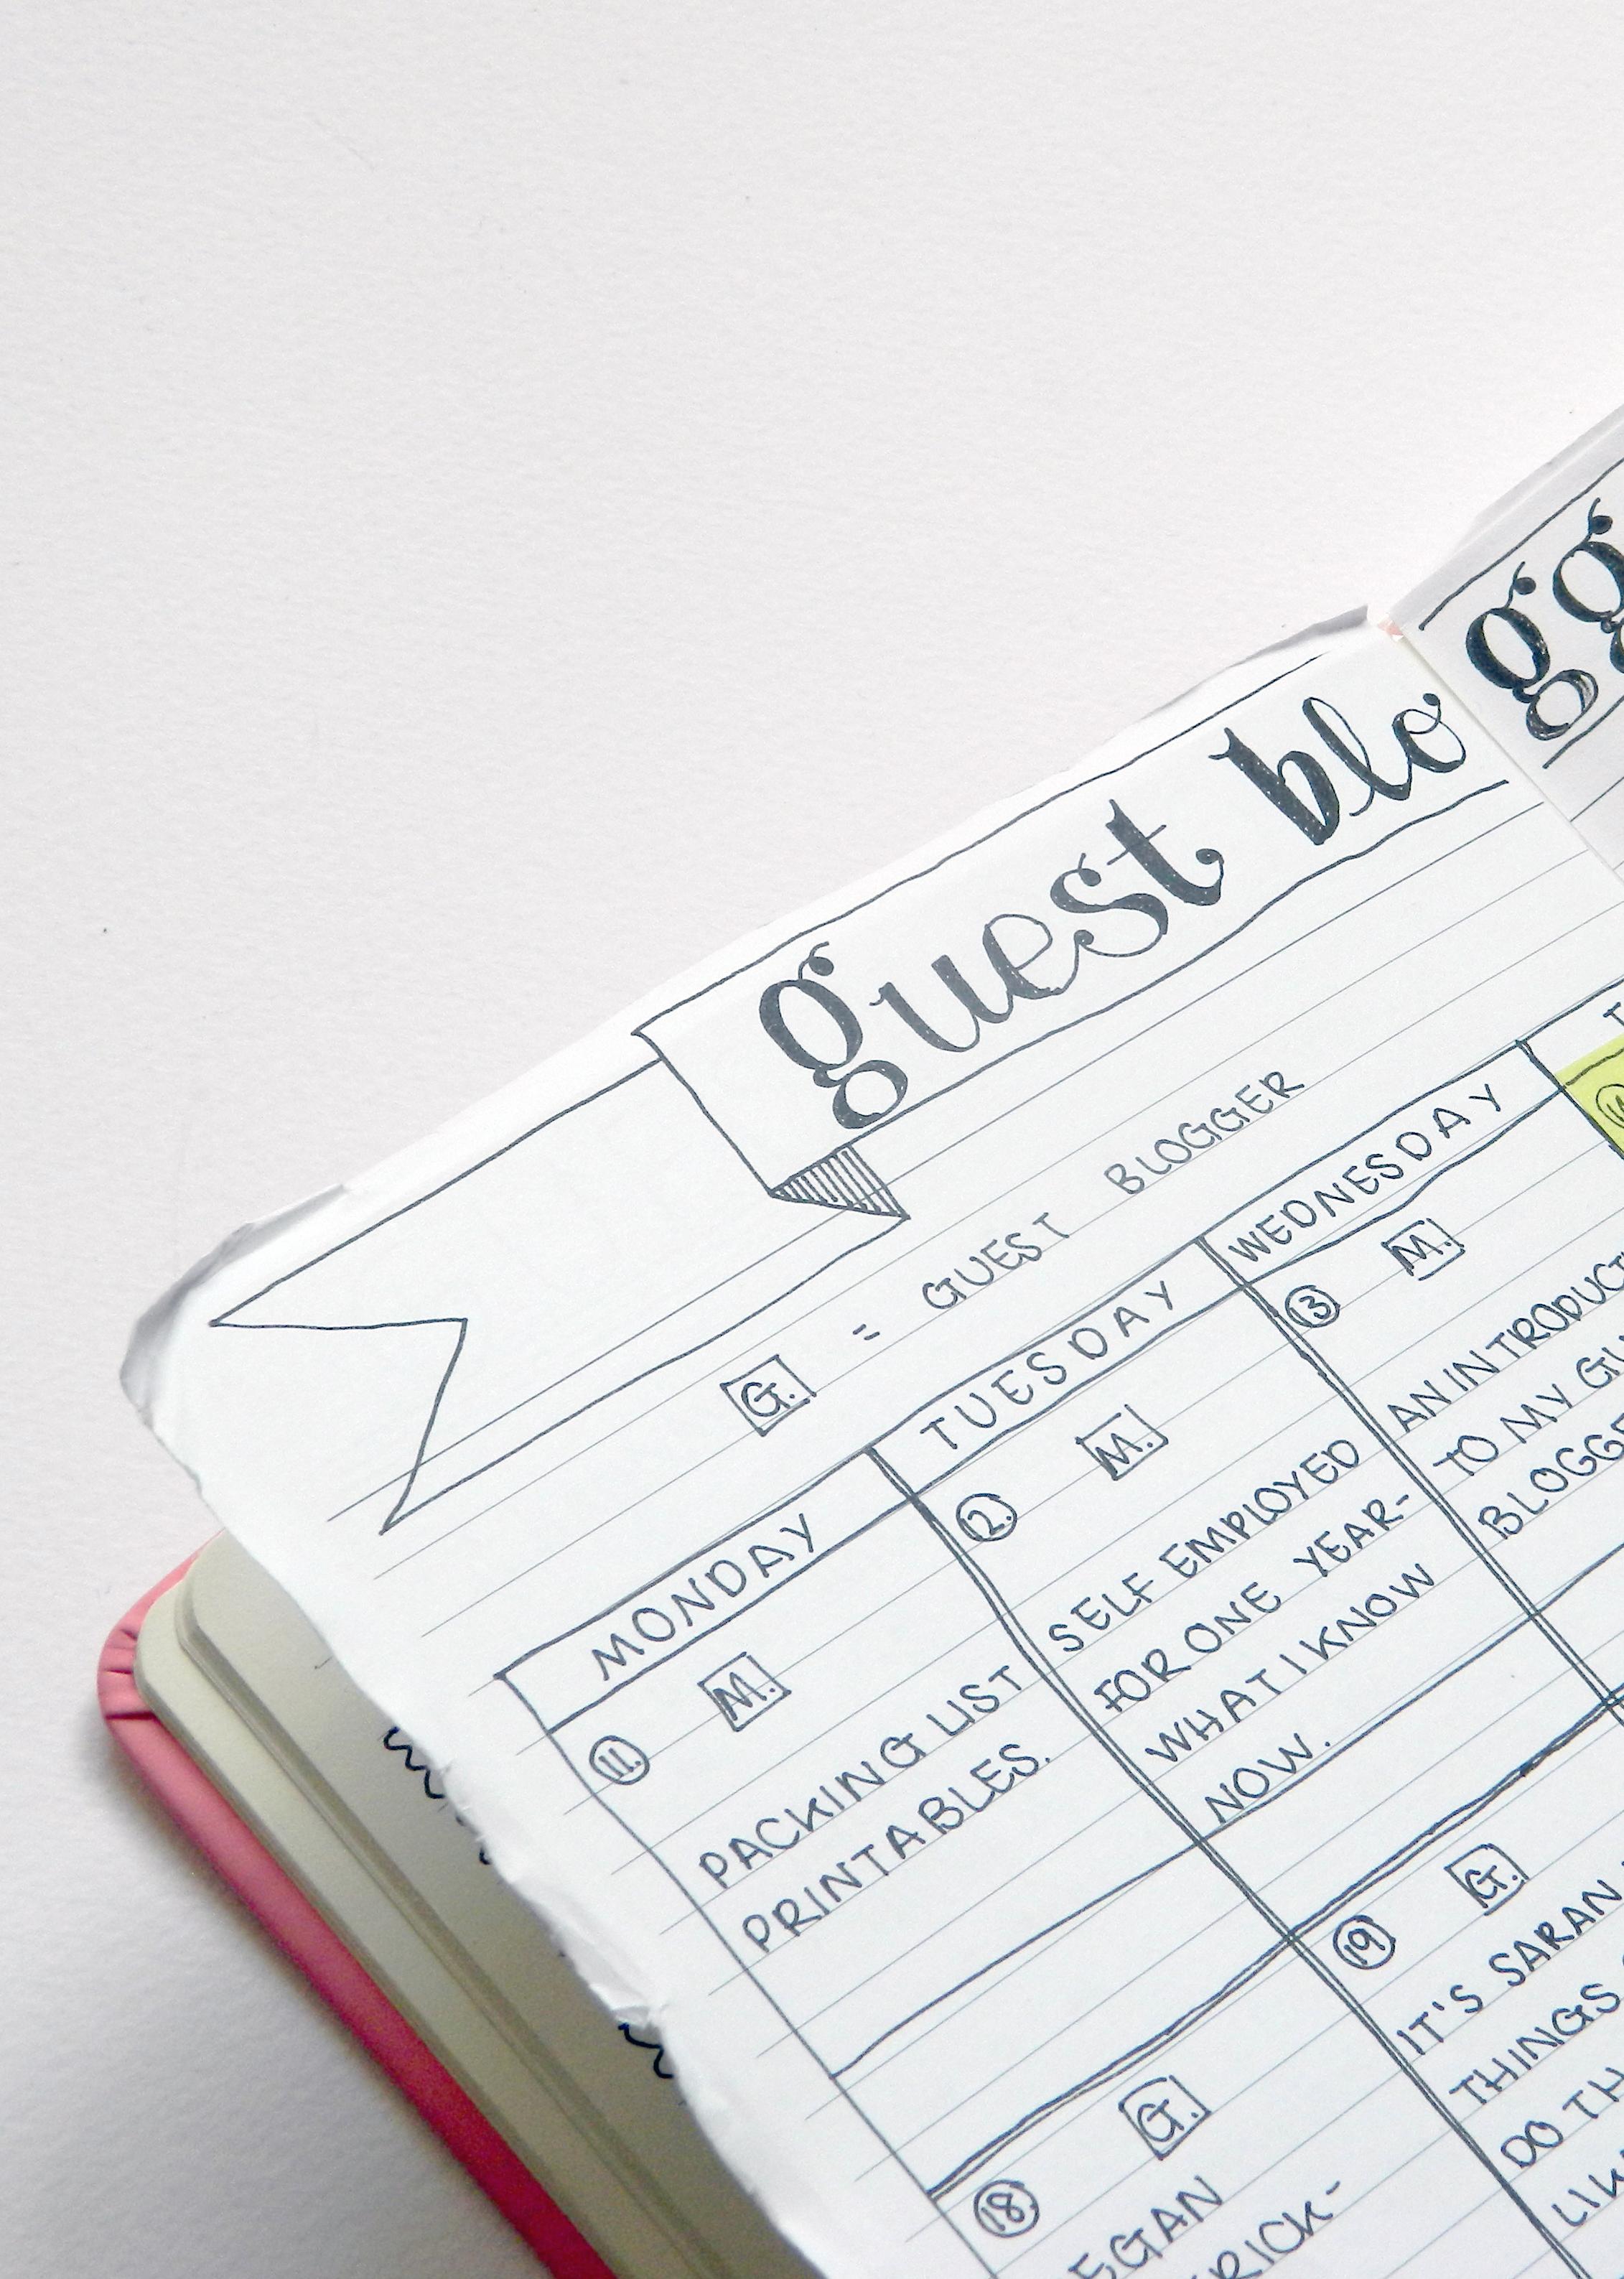 My Guest Blog Schedule in my Bullet Journal.